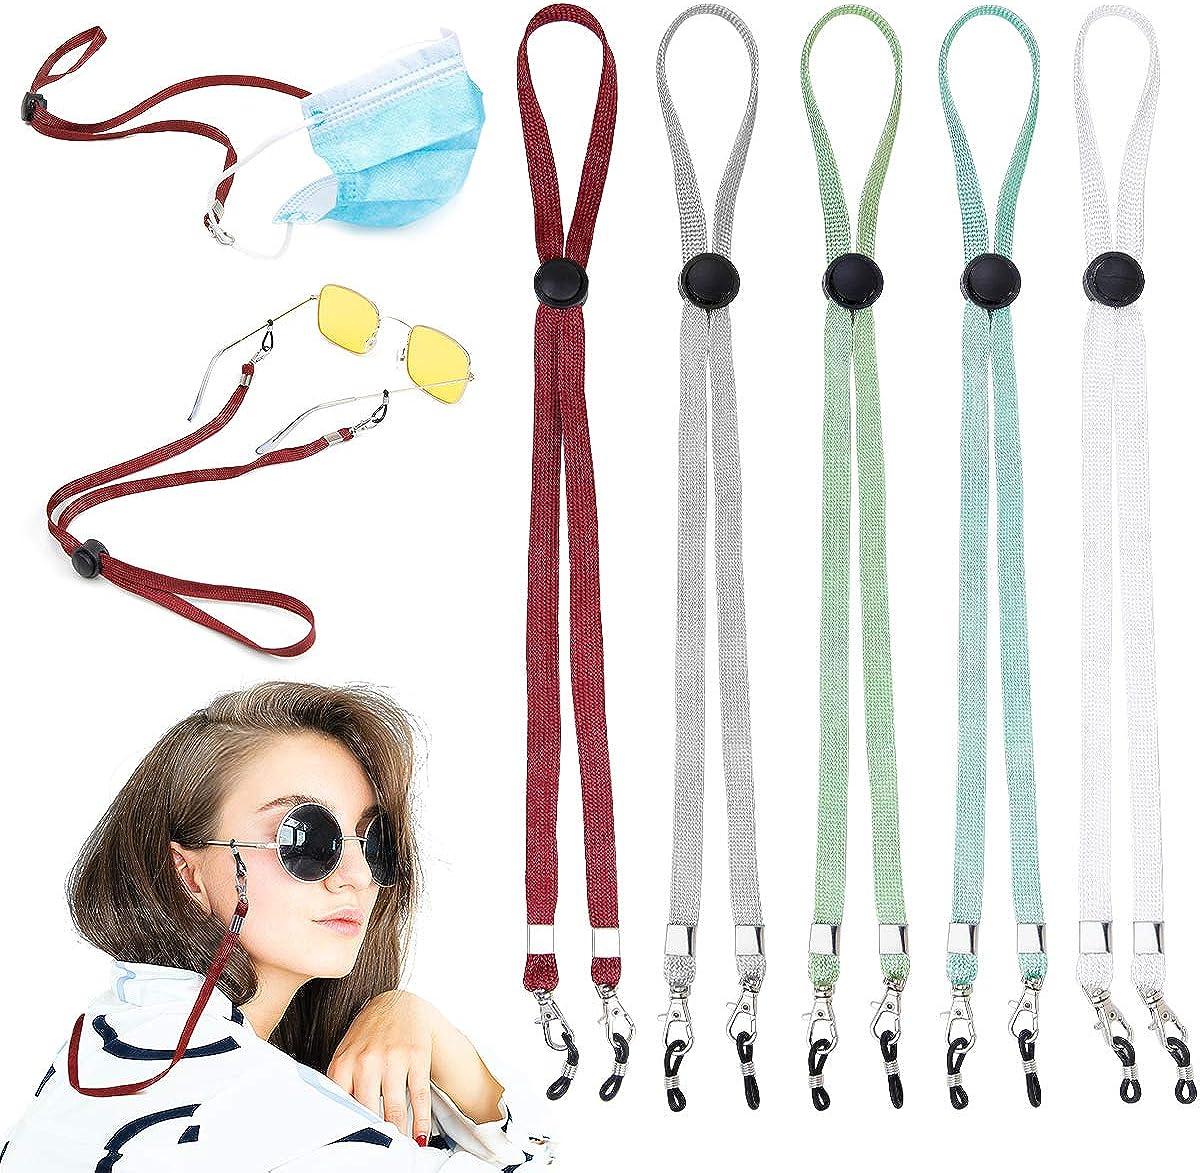 10 Pack Multifunction Mask Lanyard Glasses Chain Adjustable Length Strap Cord Necklace Suitable for women men chirdren elder